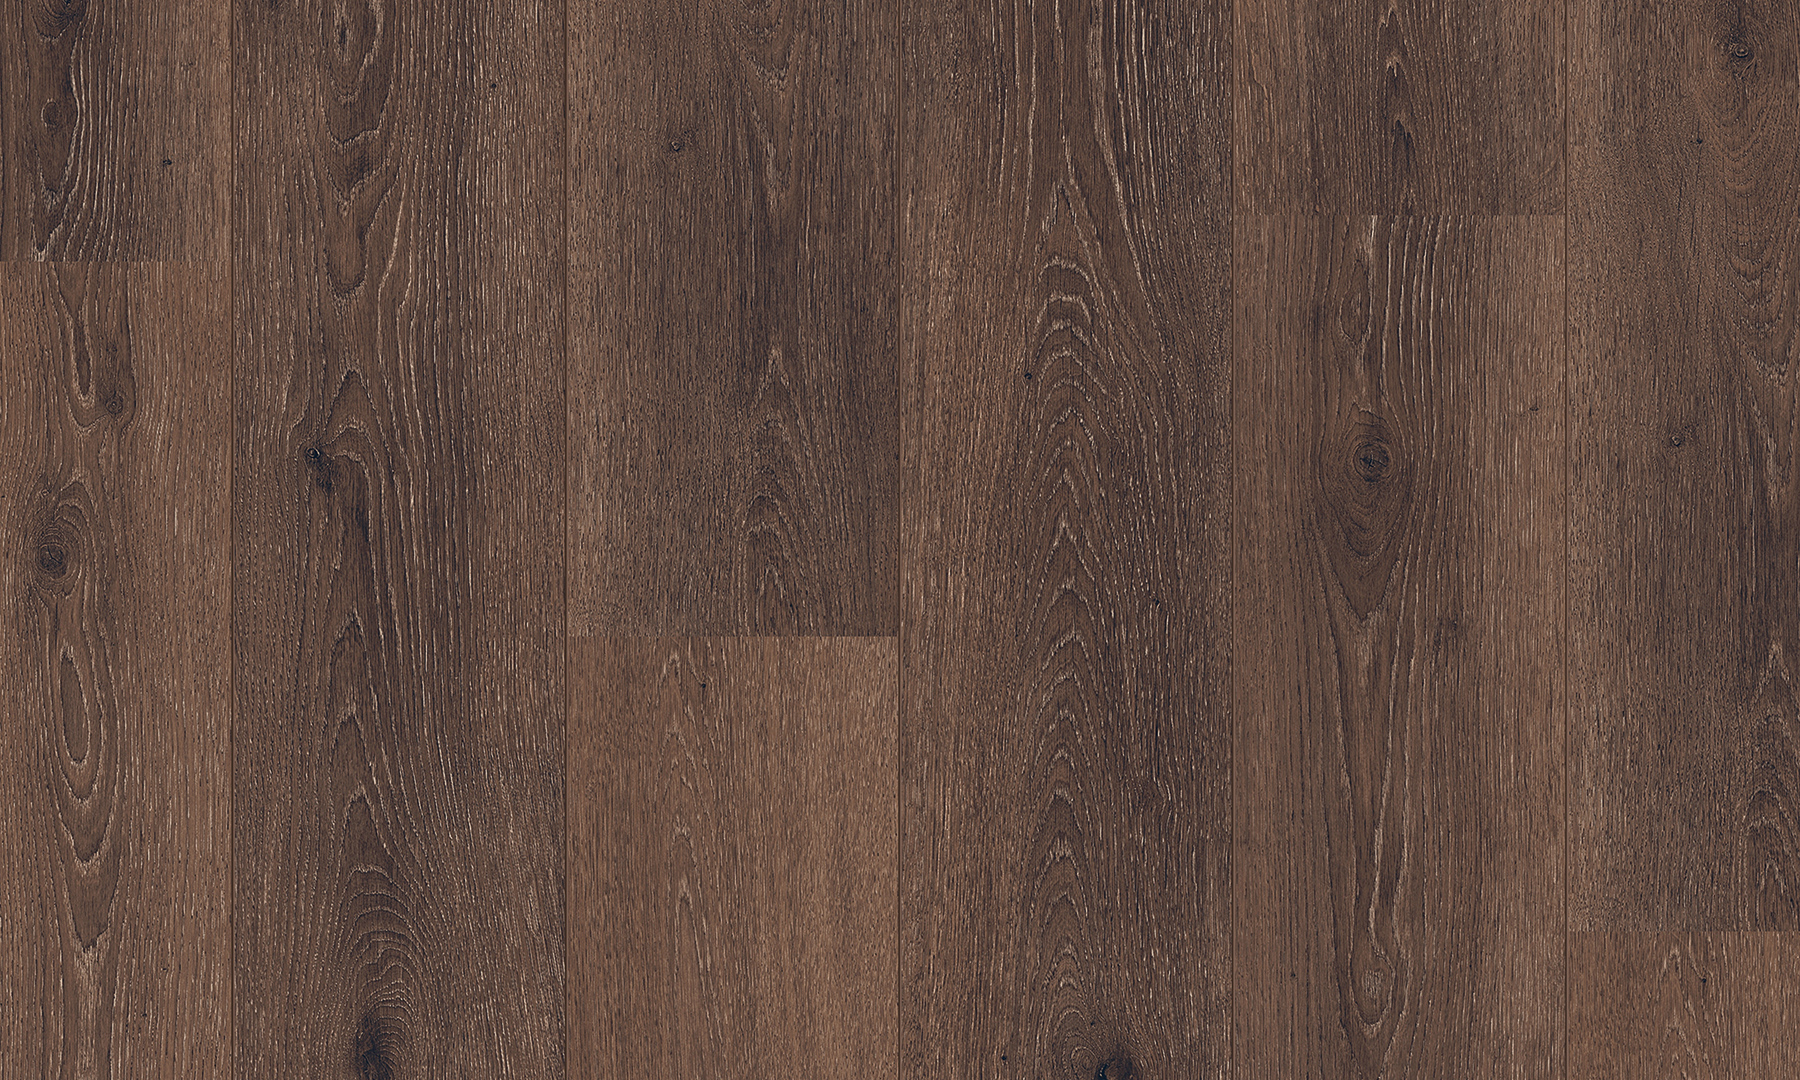 Pergo Commercial Laminate Flooring Thermotreated Oak